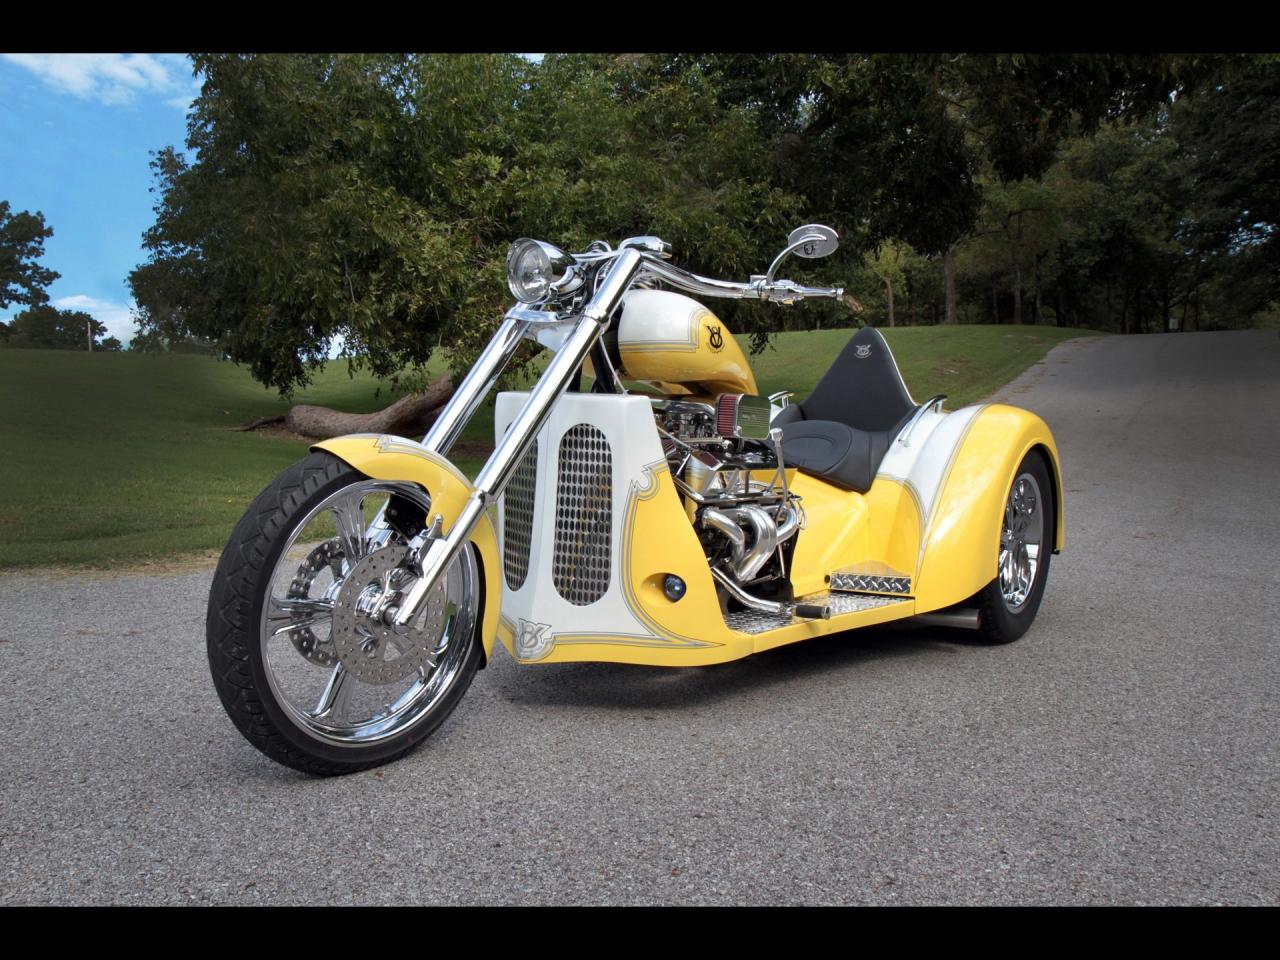 V8 Choppers SP - 1280x960